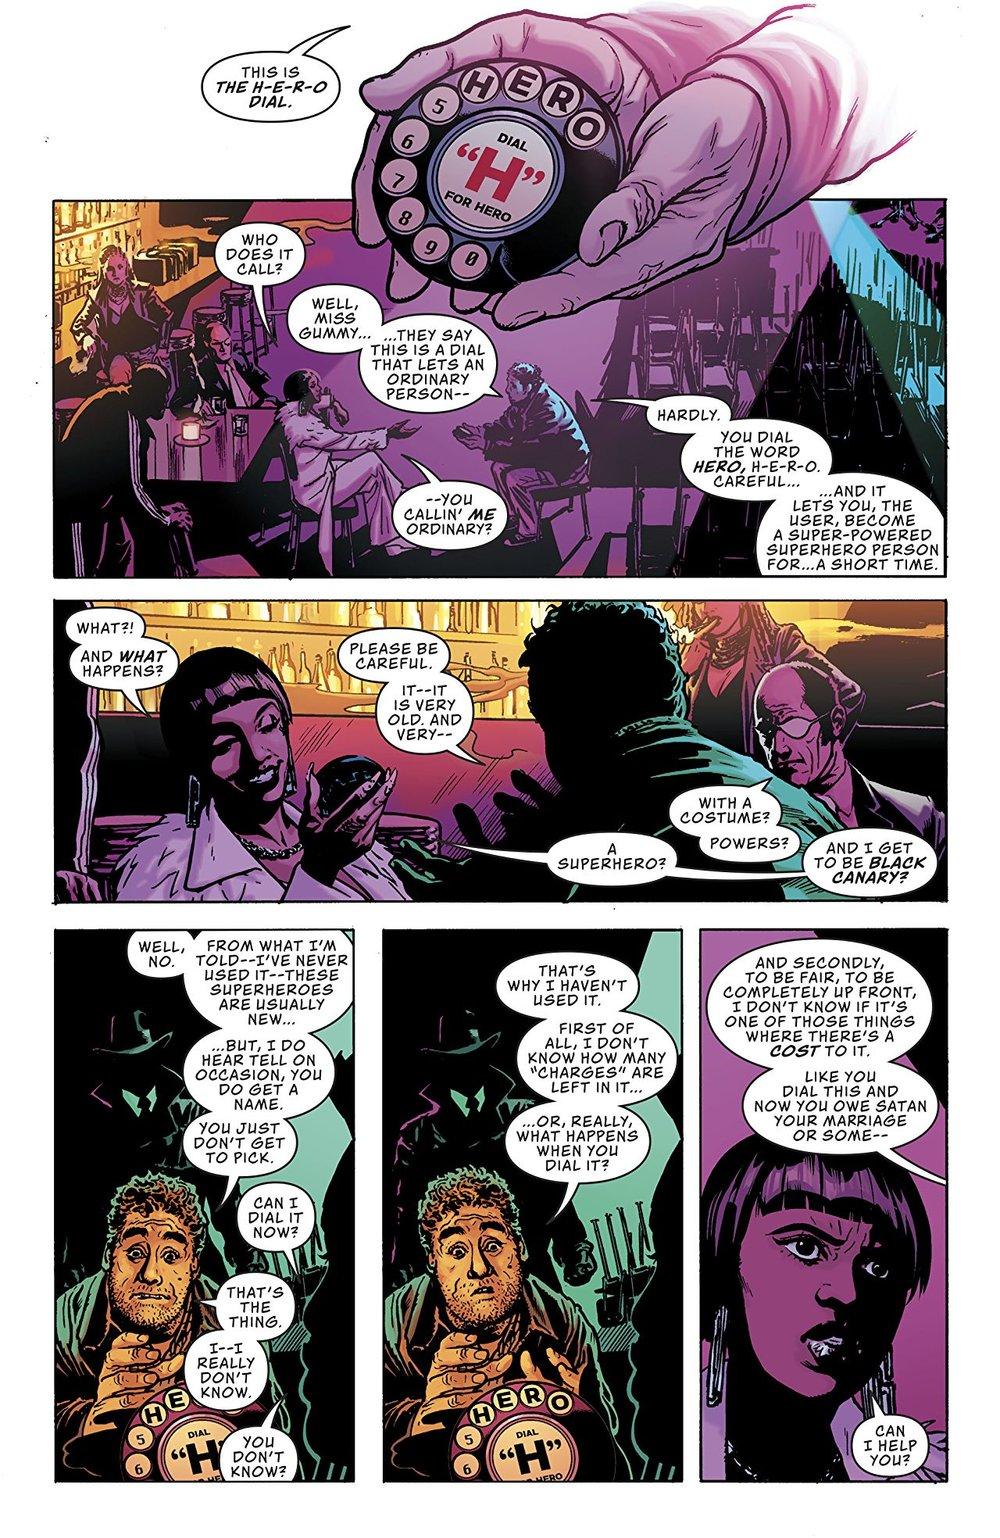 Action Comics 1005 2.jpg